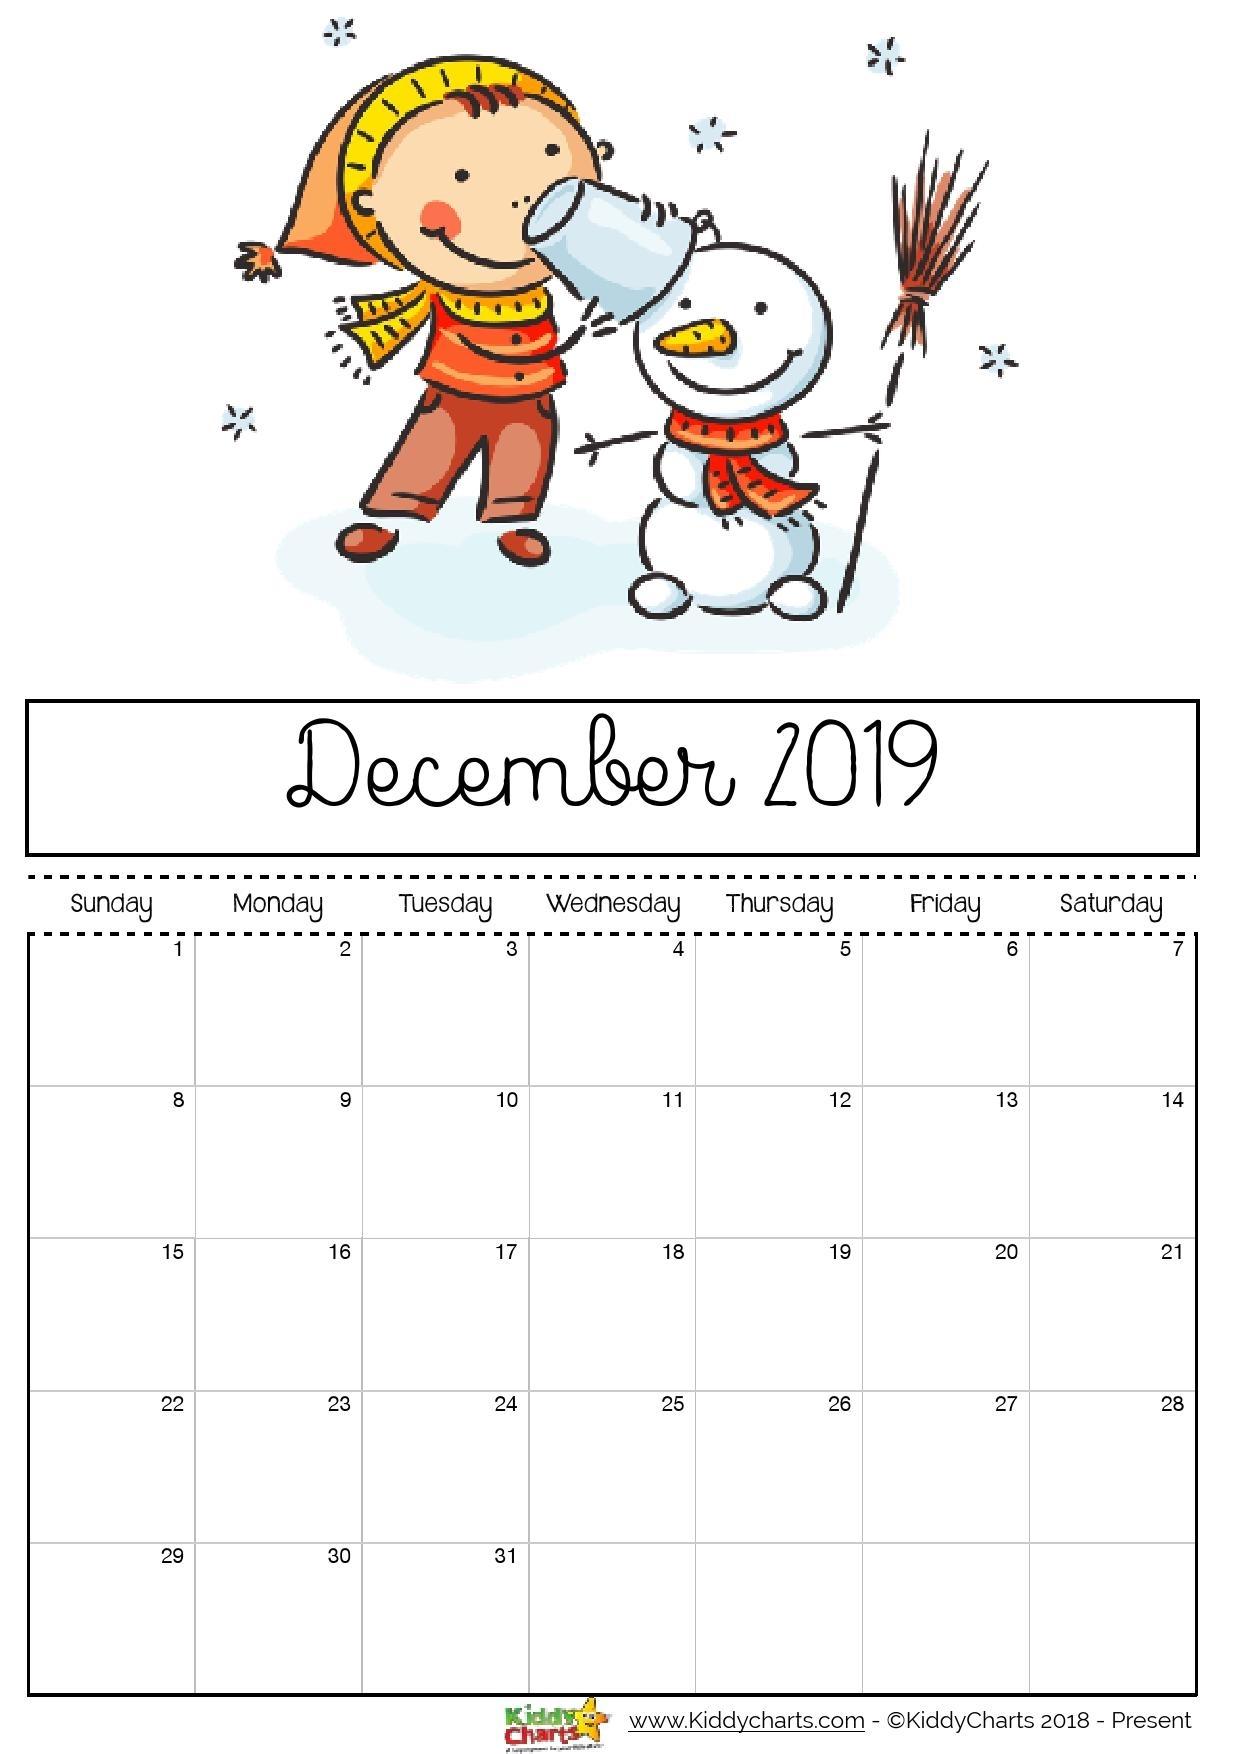 Free Printable 2019 Calendar - Print Yours Here   Kiddycharts